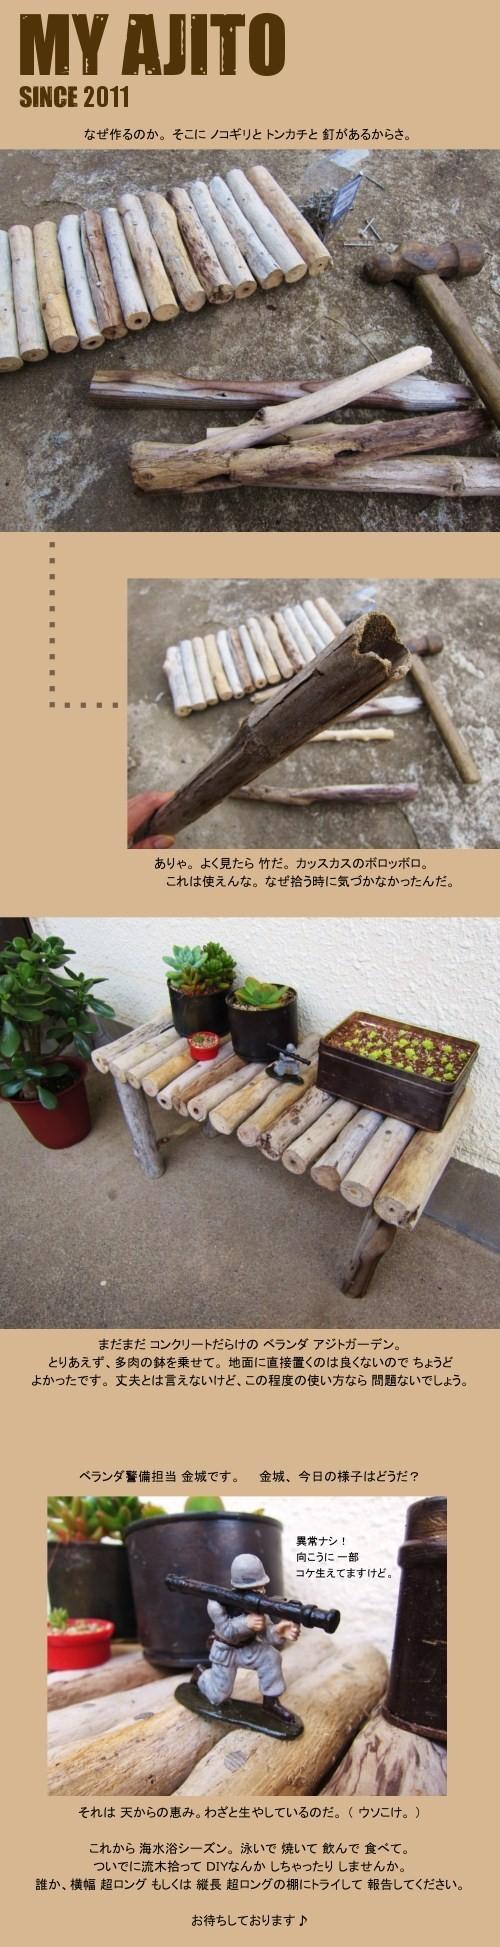 ryu_4.jpg